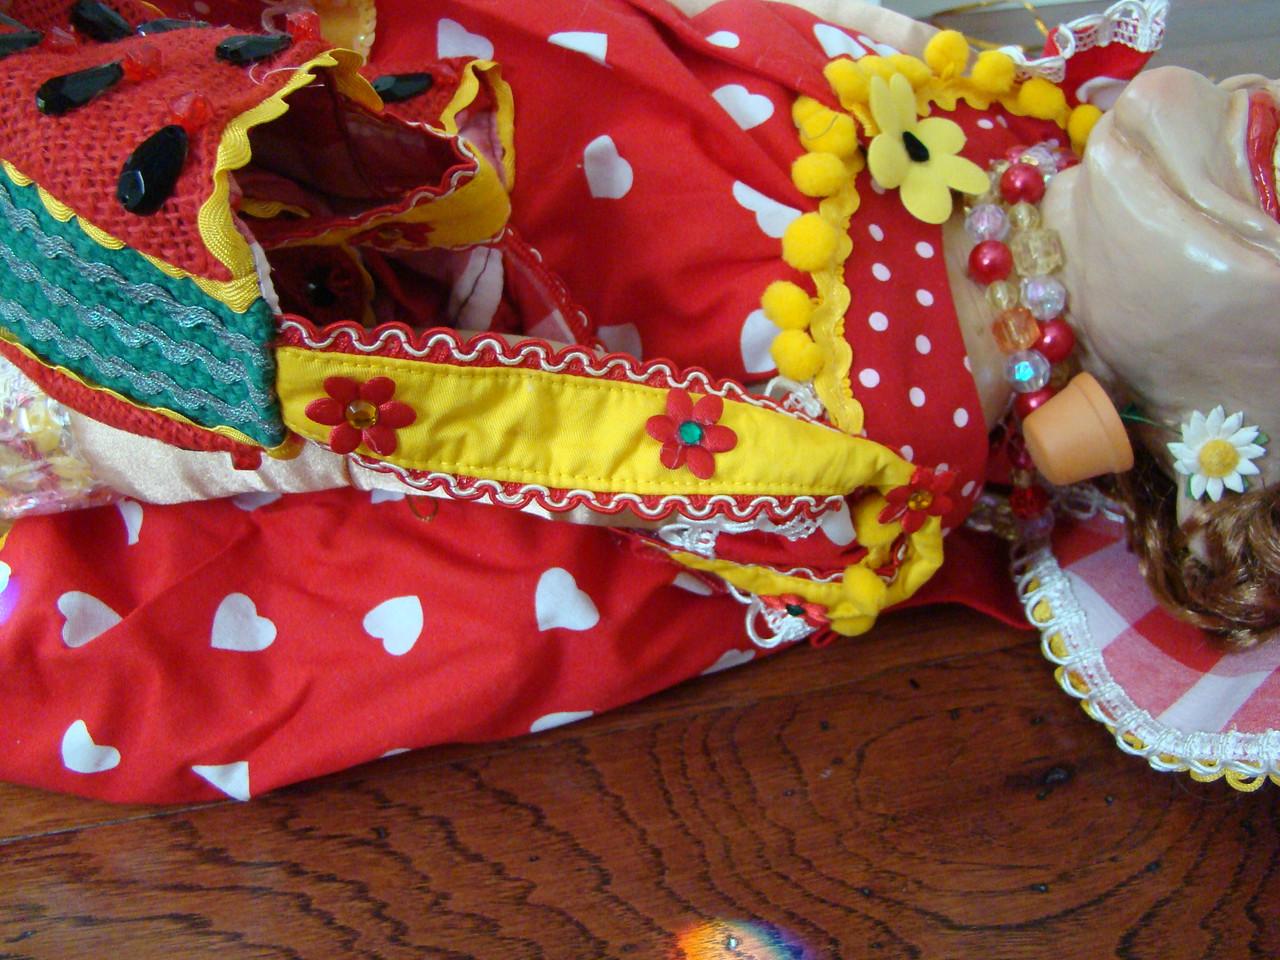 Katherine's Collection GARDEN EULA Wayne Kleski Doll  27 Inch